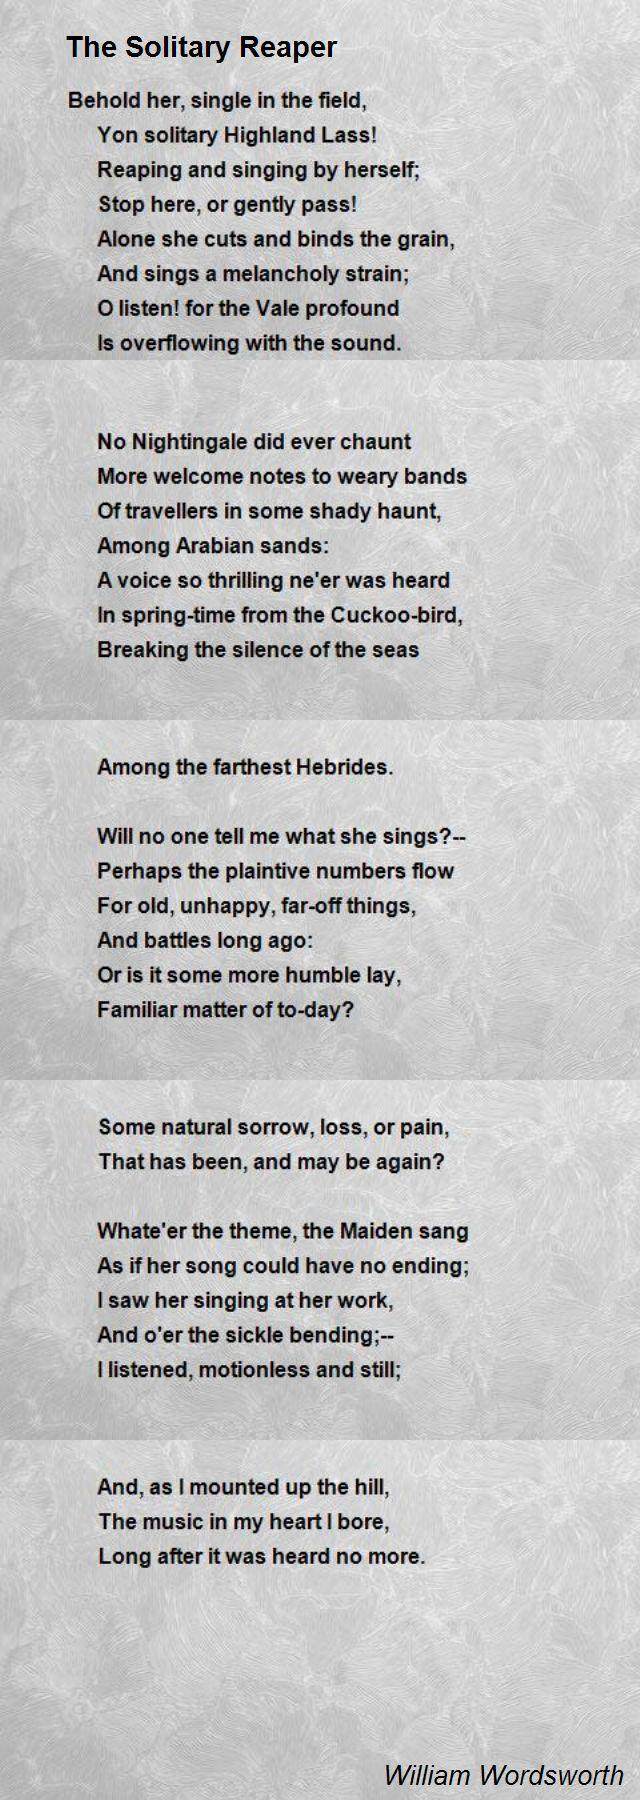 Solitary reaper william wordsworth poem analysis